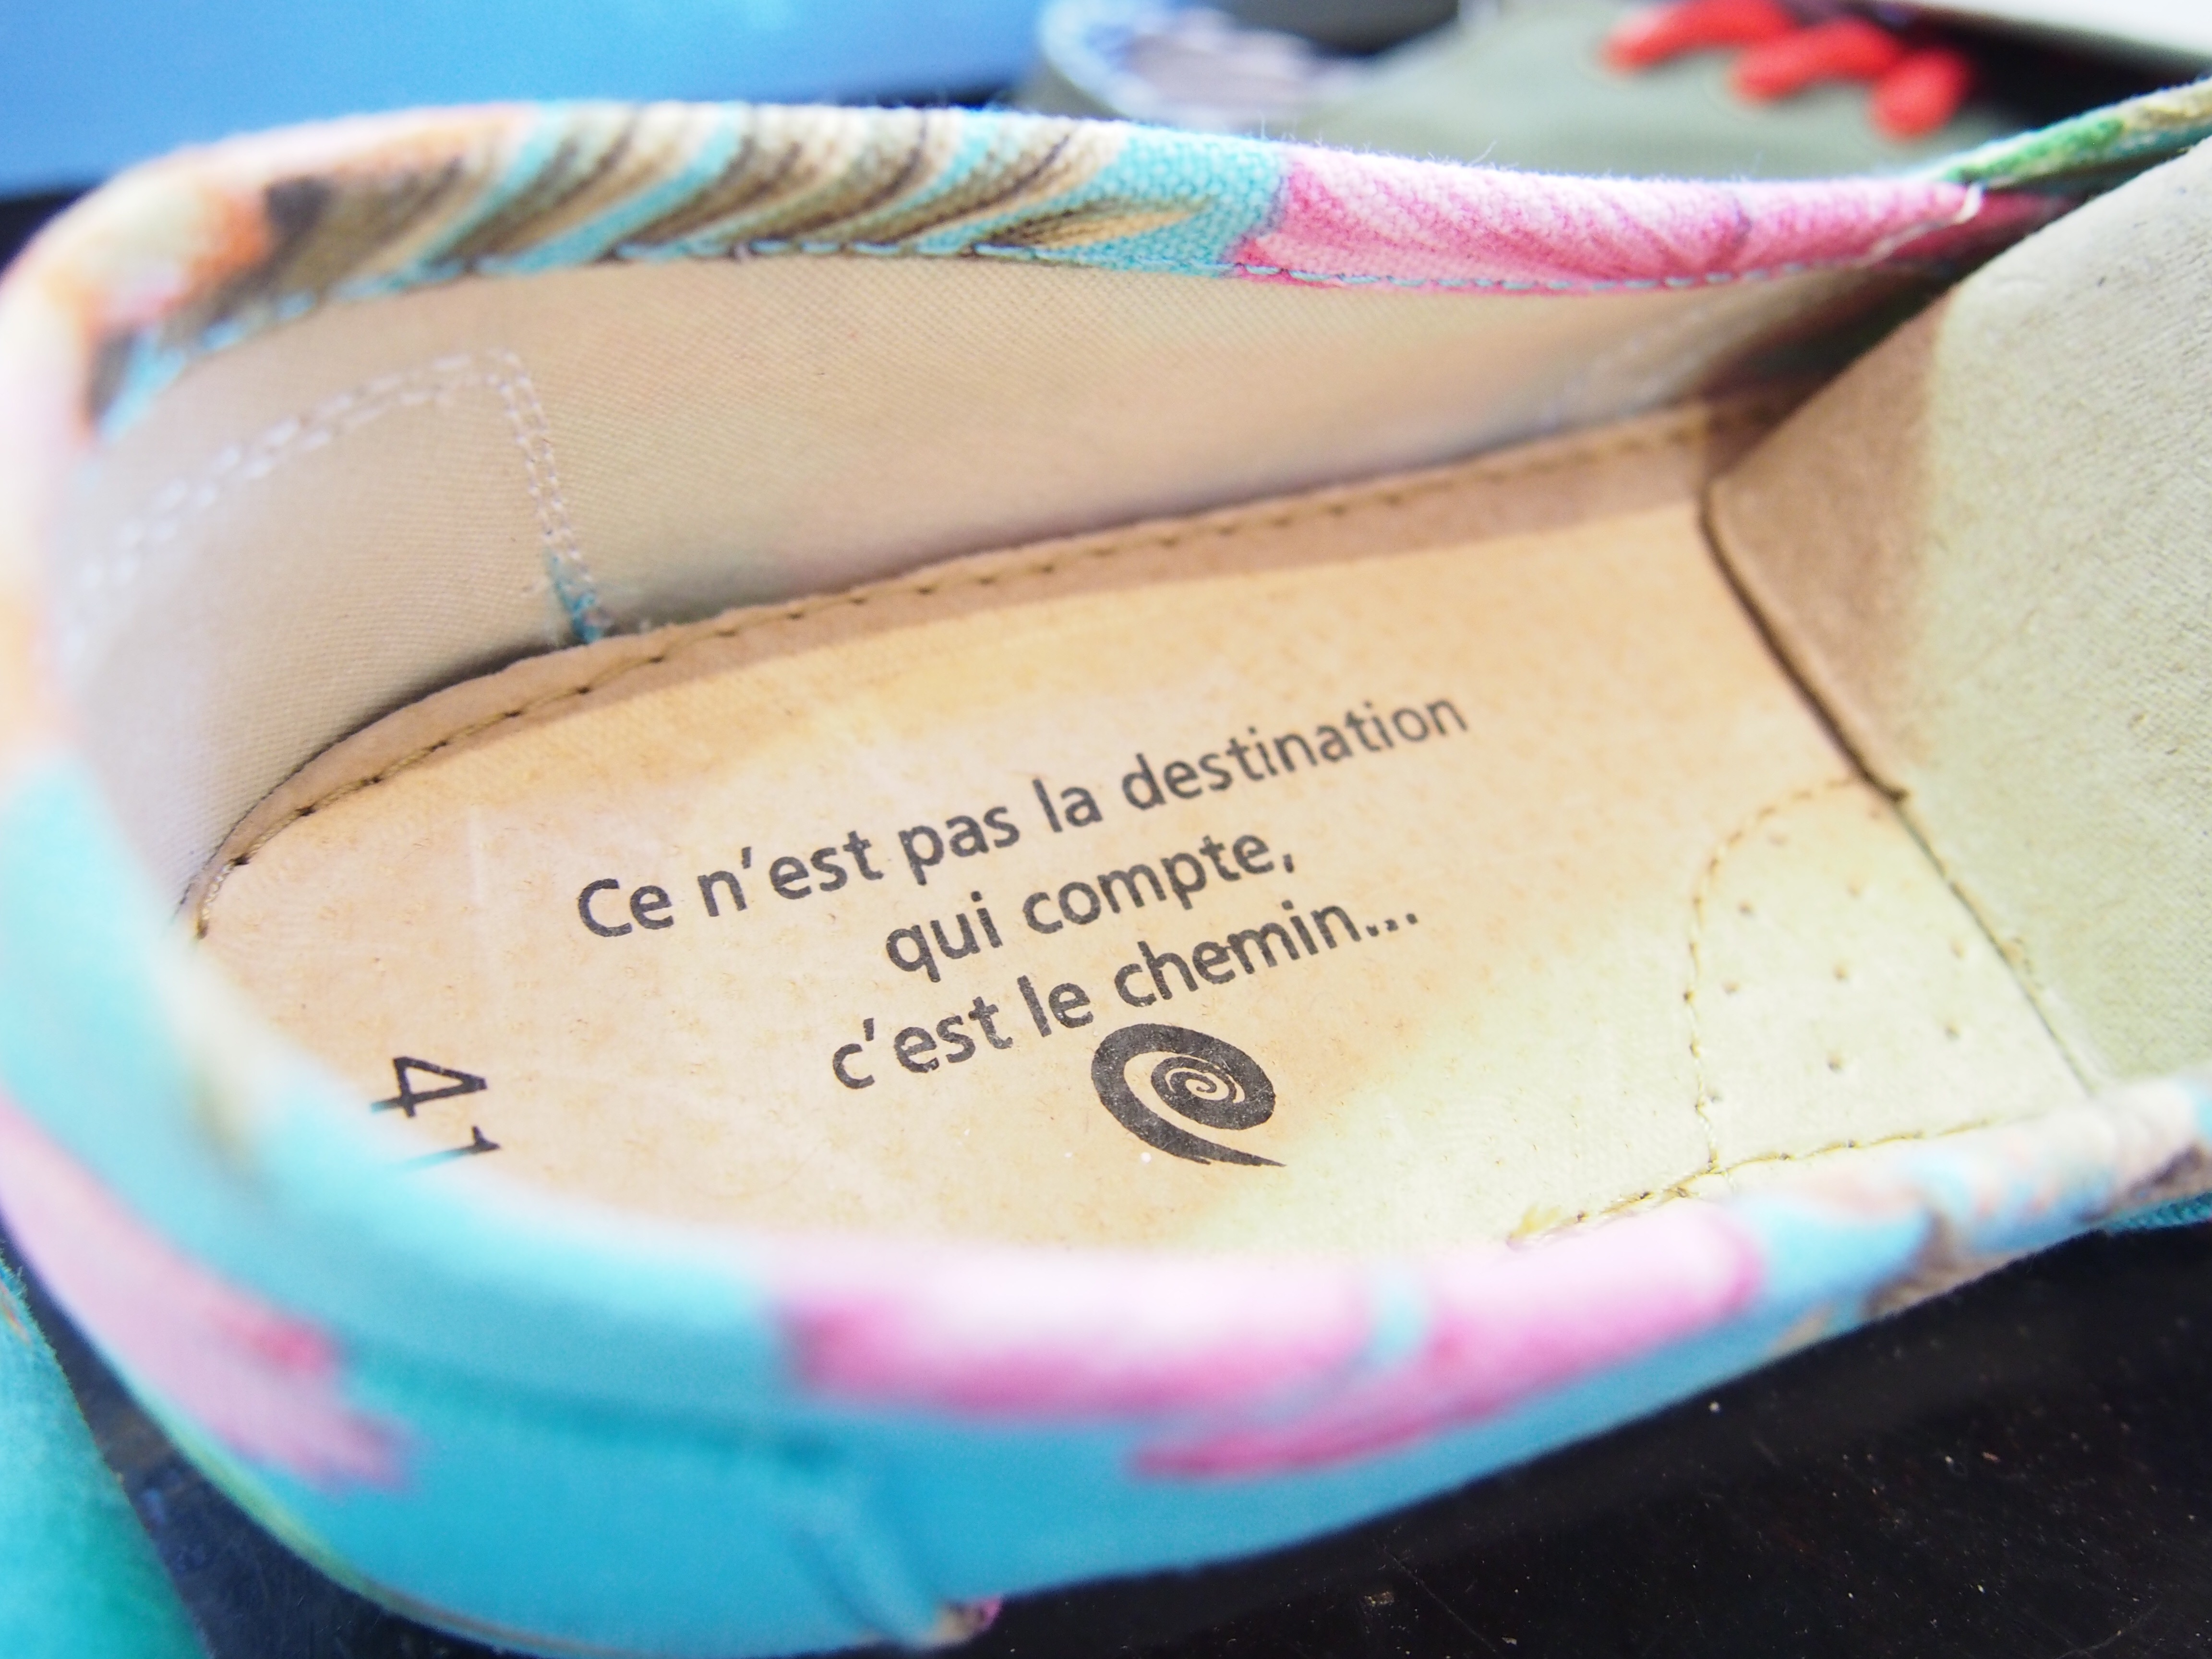 espadrilles-espigas-marseille-mode-chaussures-soprettylittlethings